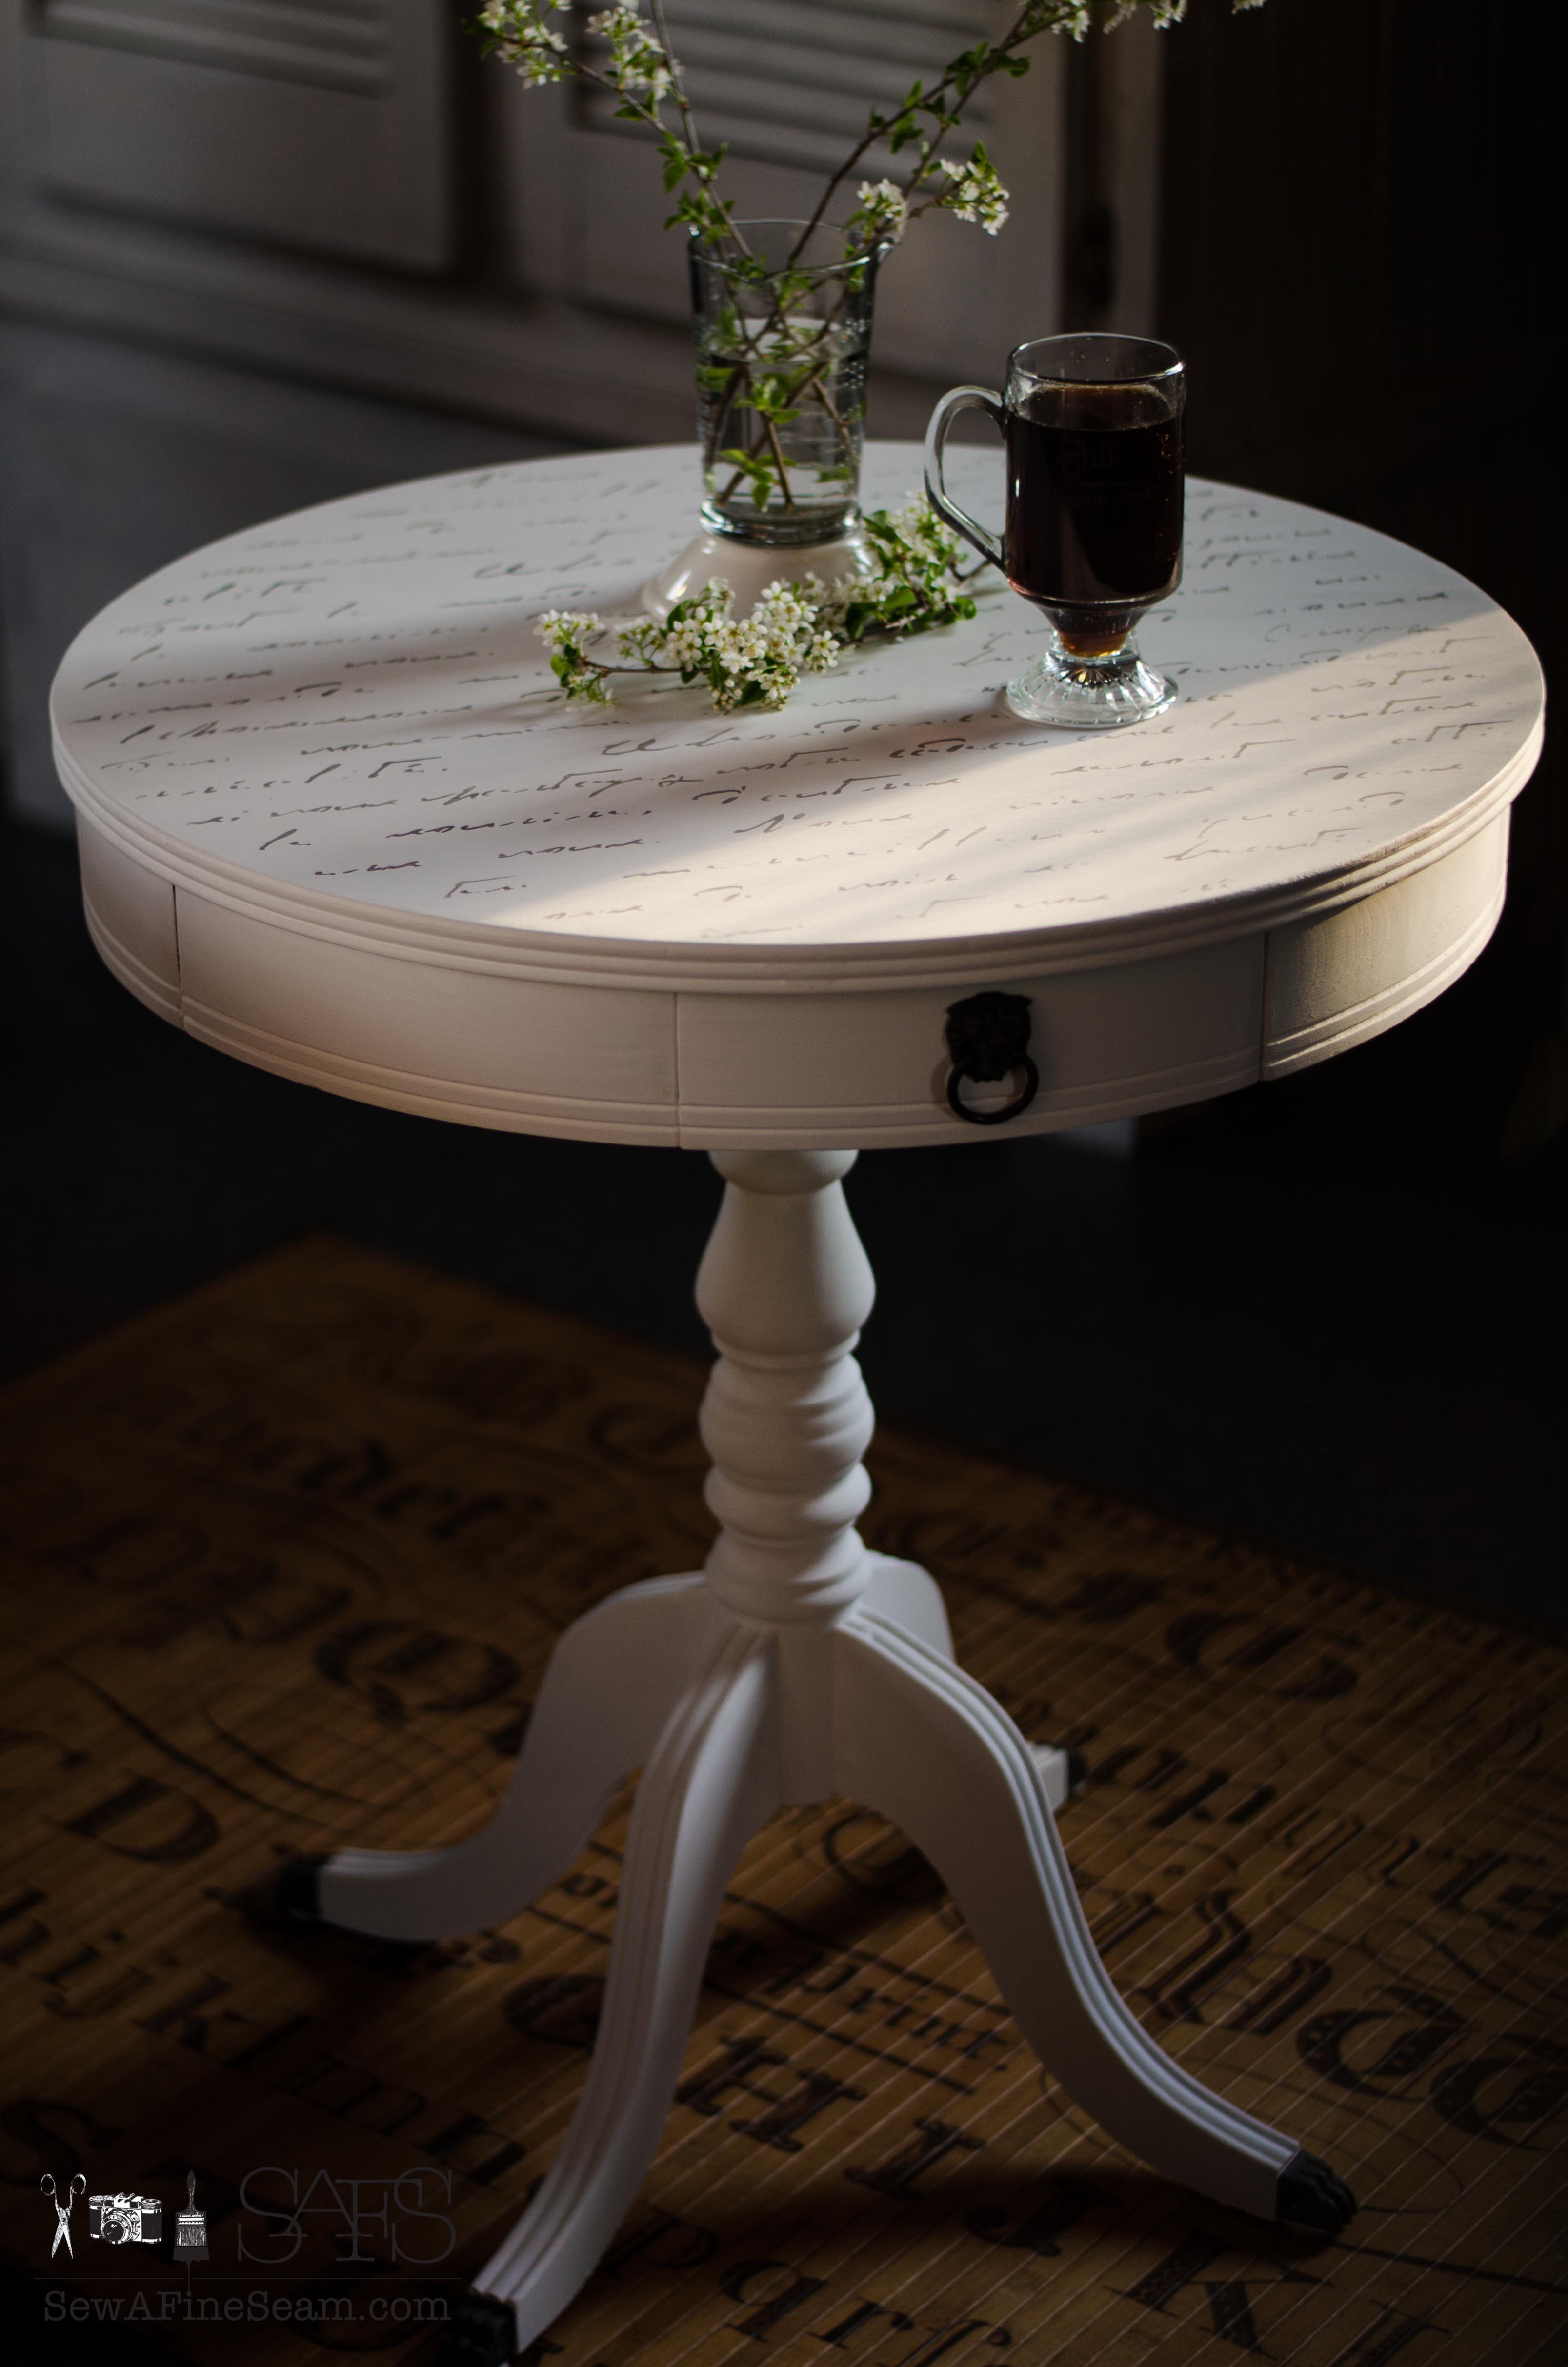 morning meditation tea table - photo #20